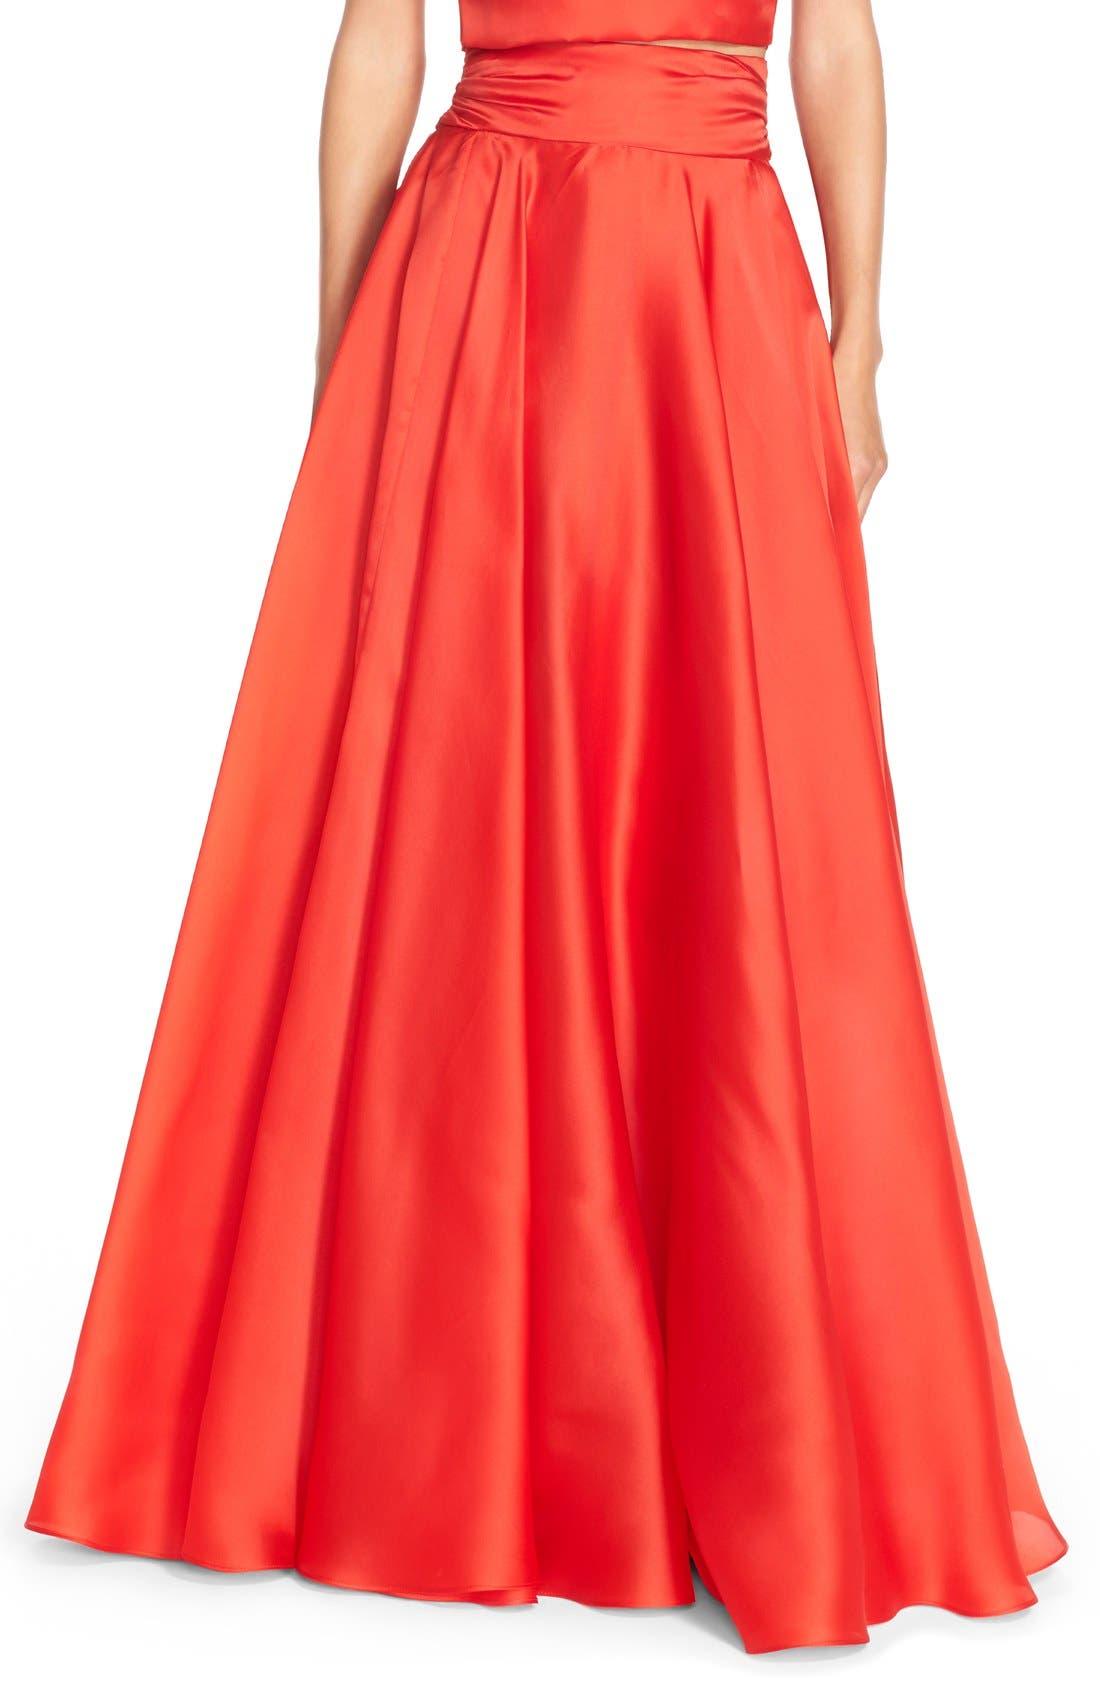 MILLY Silk Satin Bow Back Ball Skirt, Main, color, 650